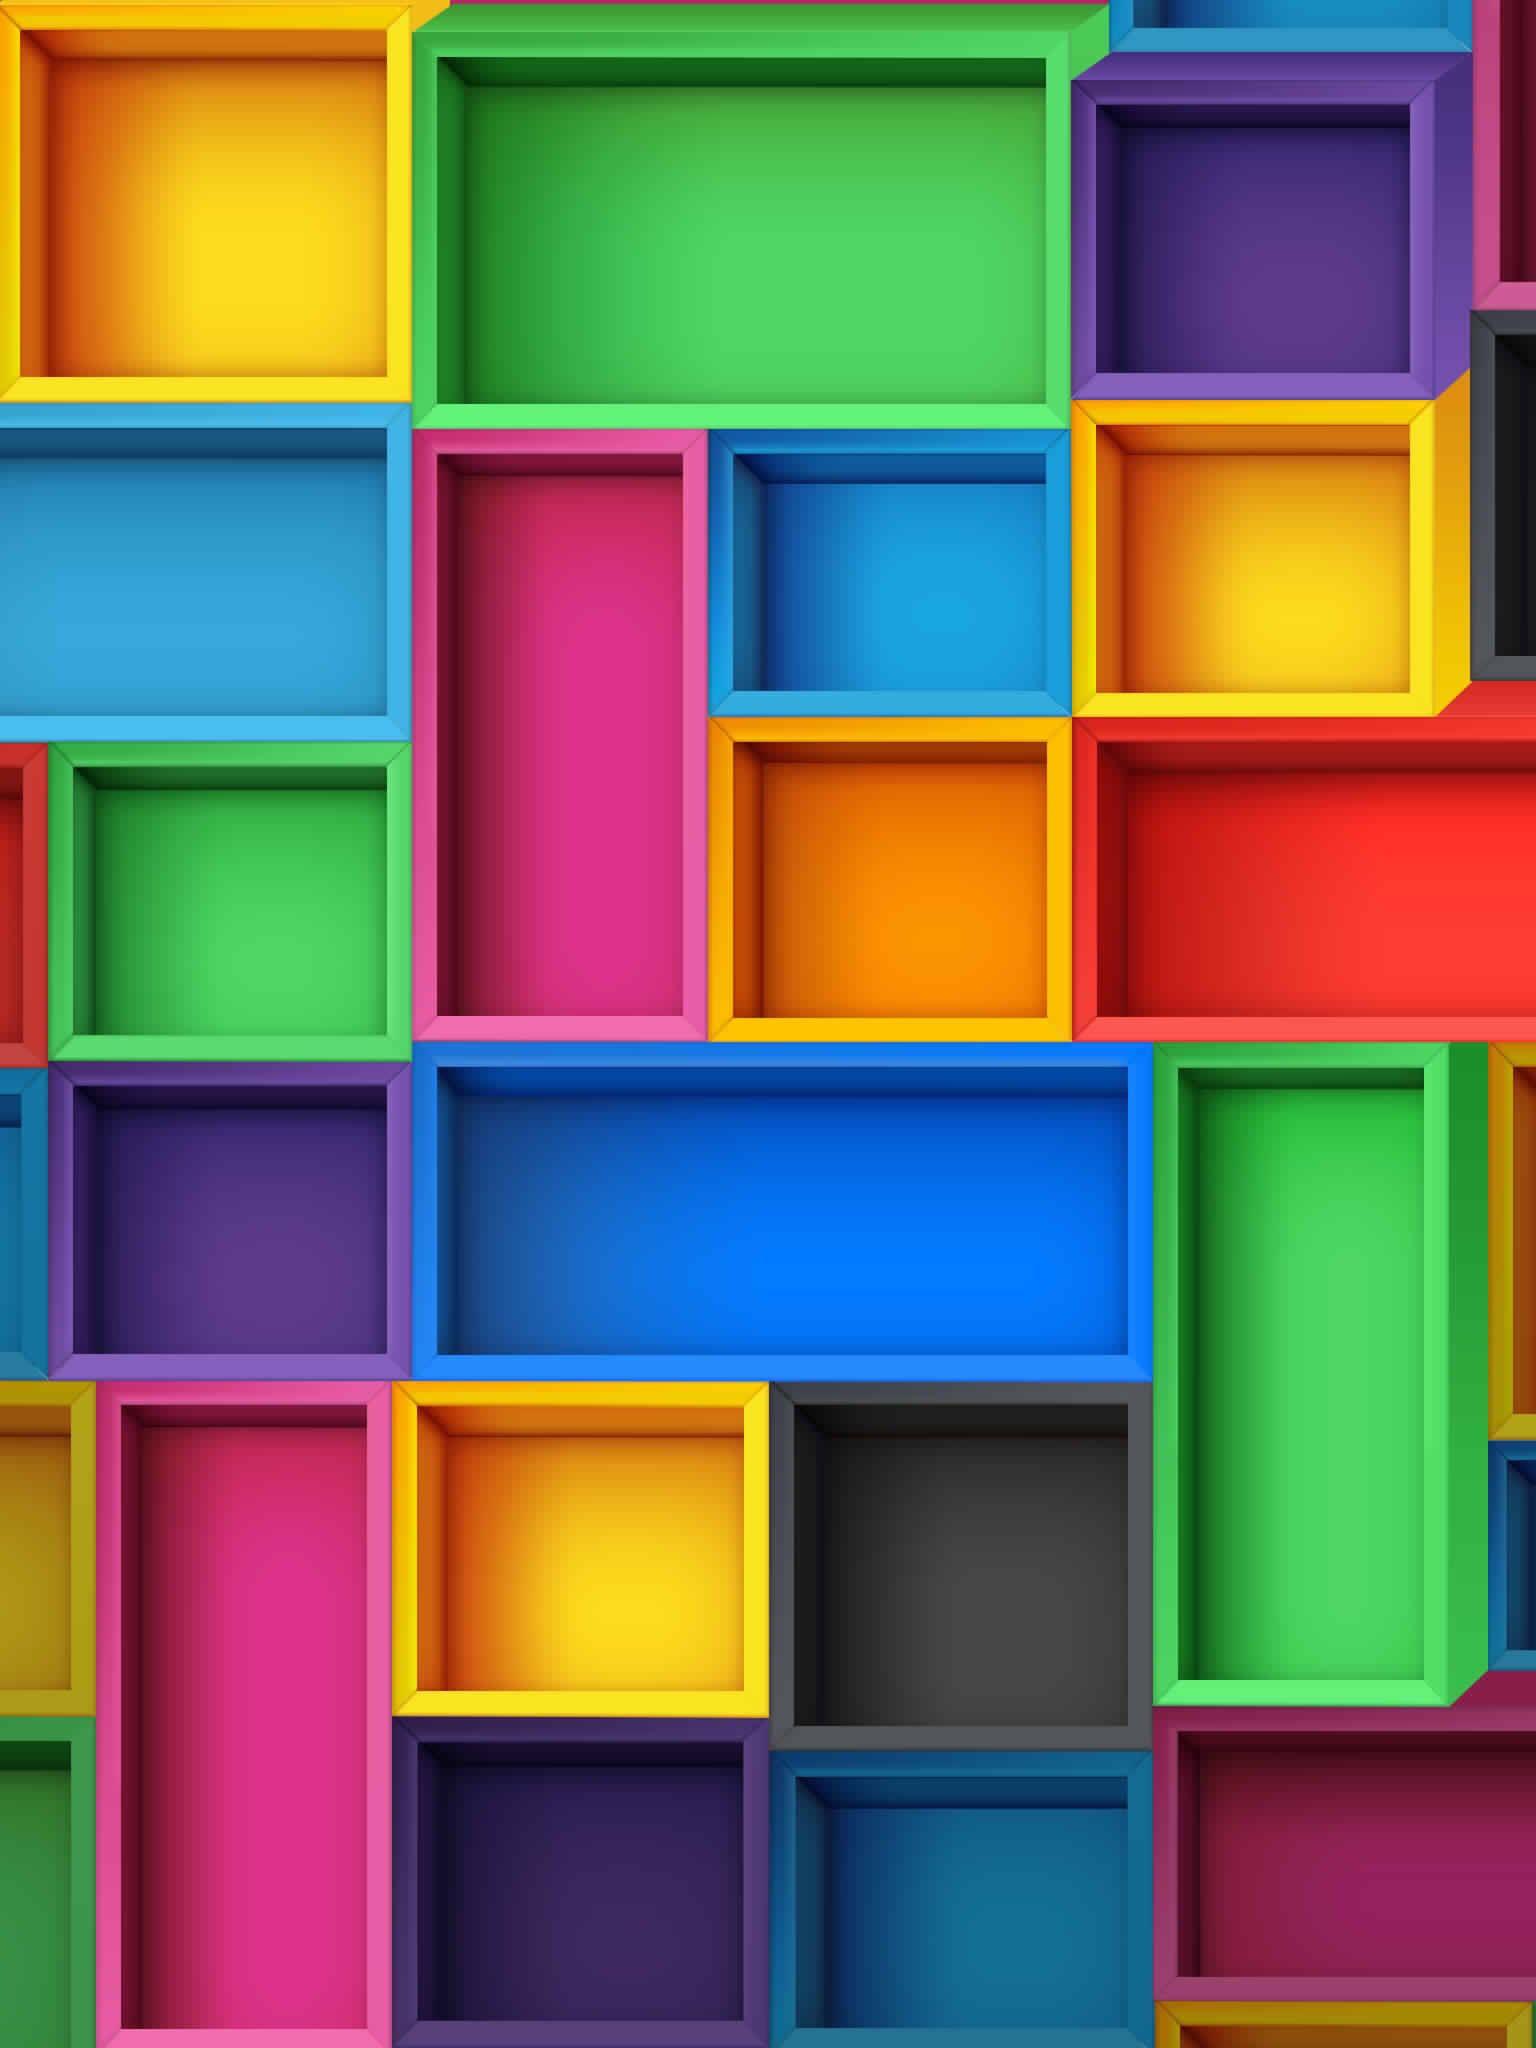 Wallpaper APP SHELVES New Backgrounds App Board Ipad Shelf